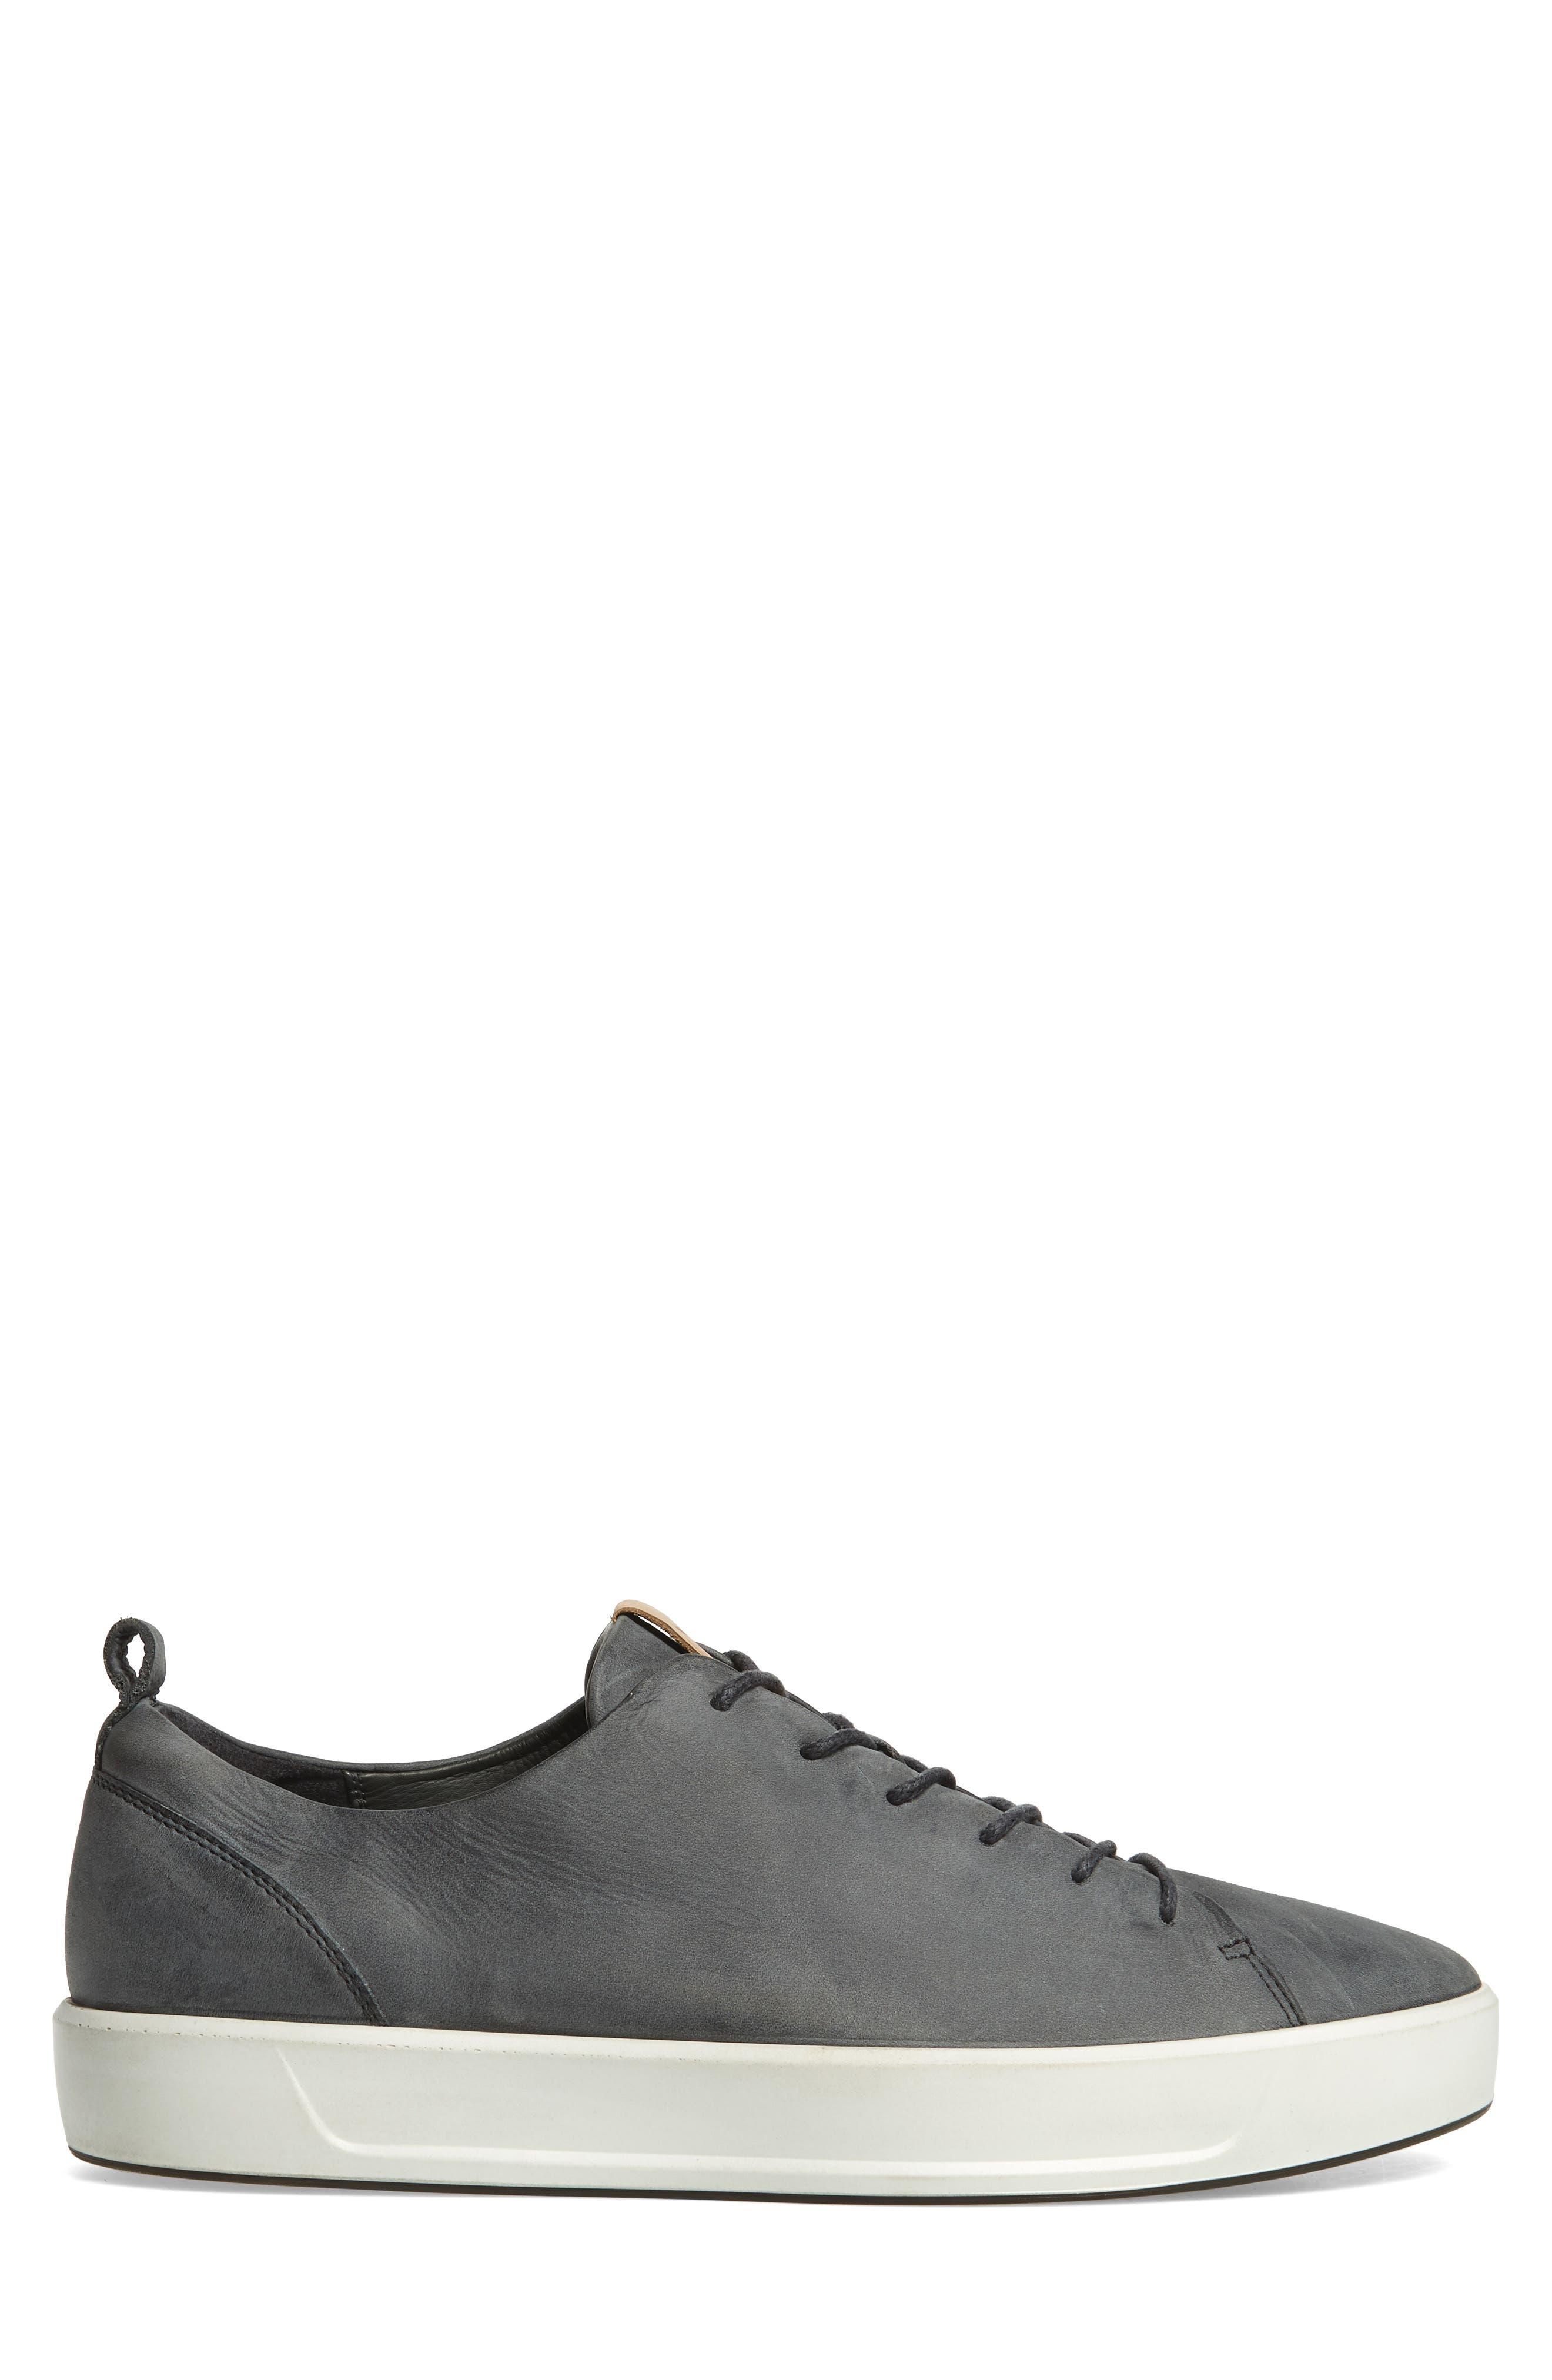 ECCO, Soft 8 Sneaker, Alternate thumbnail 3, color, 025